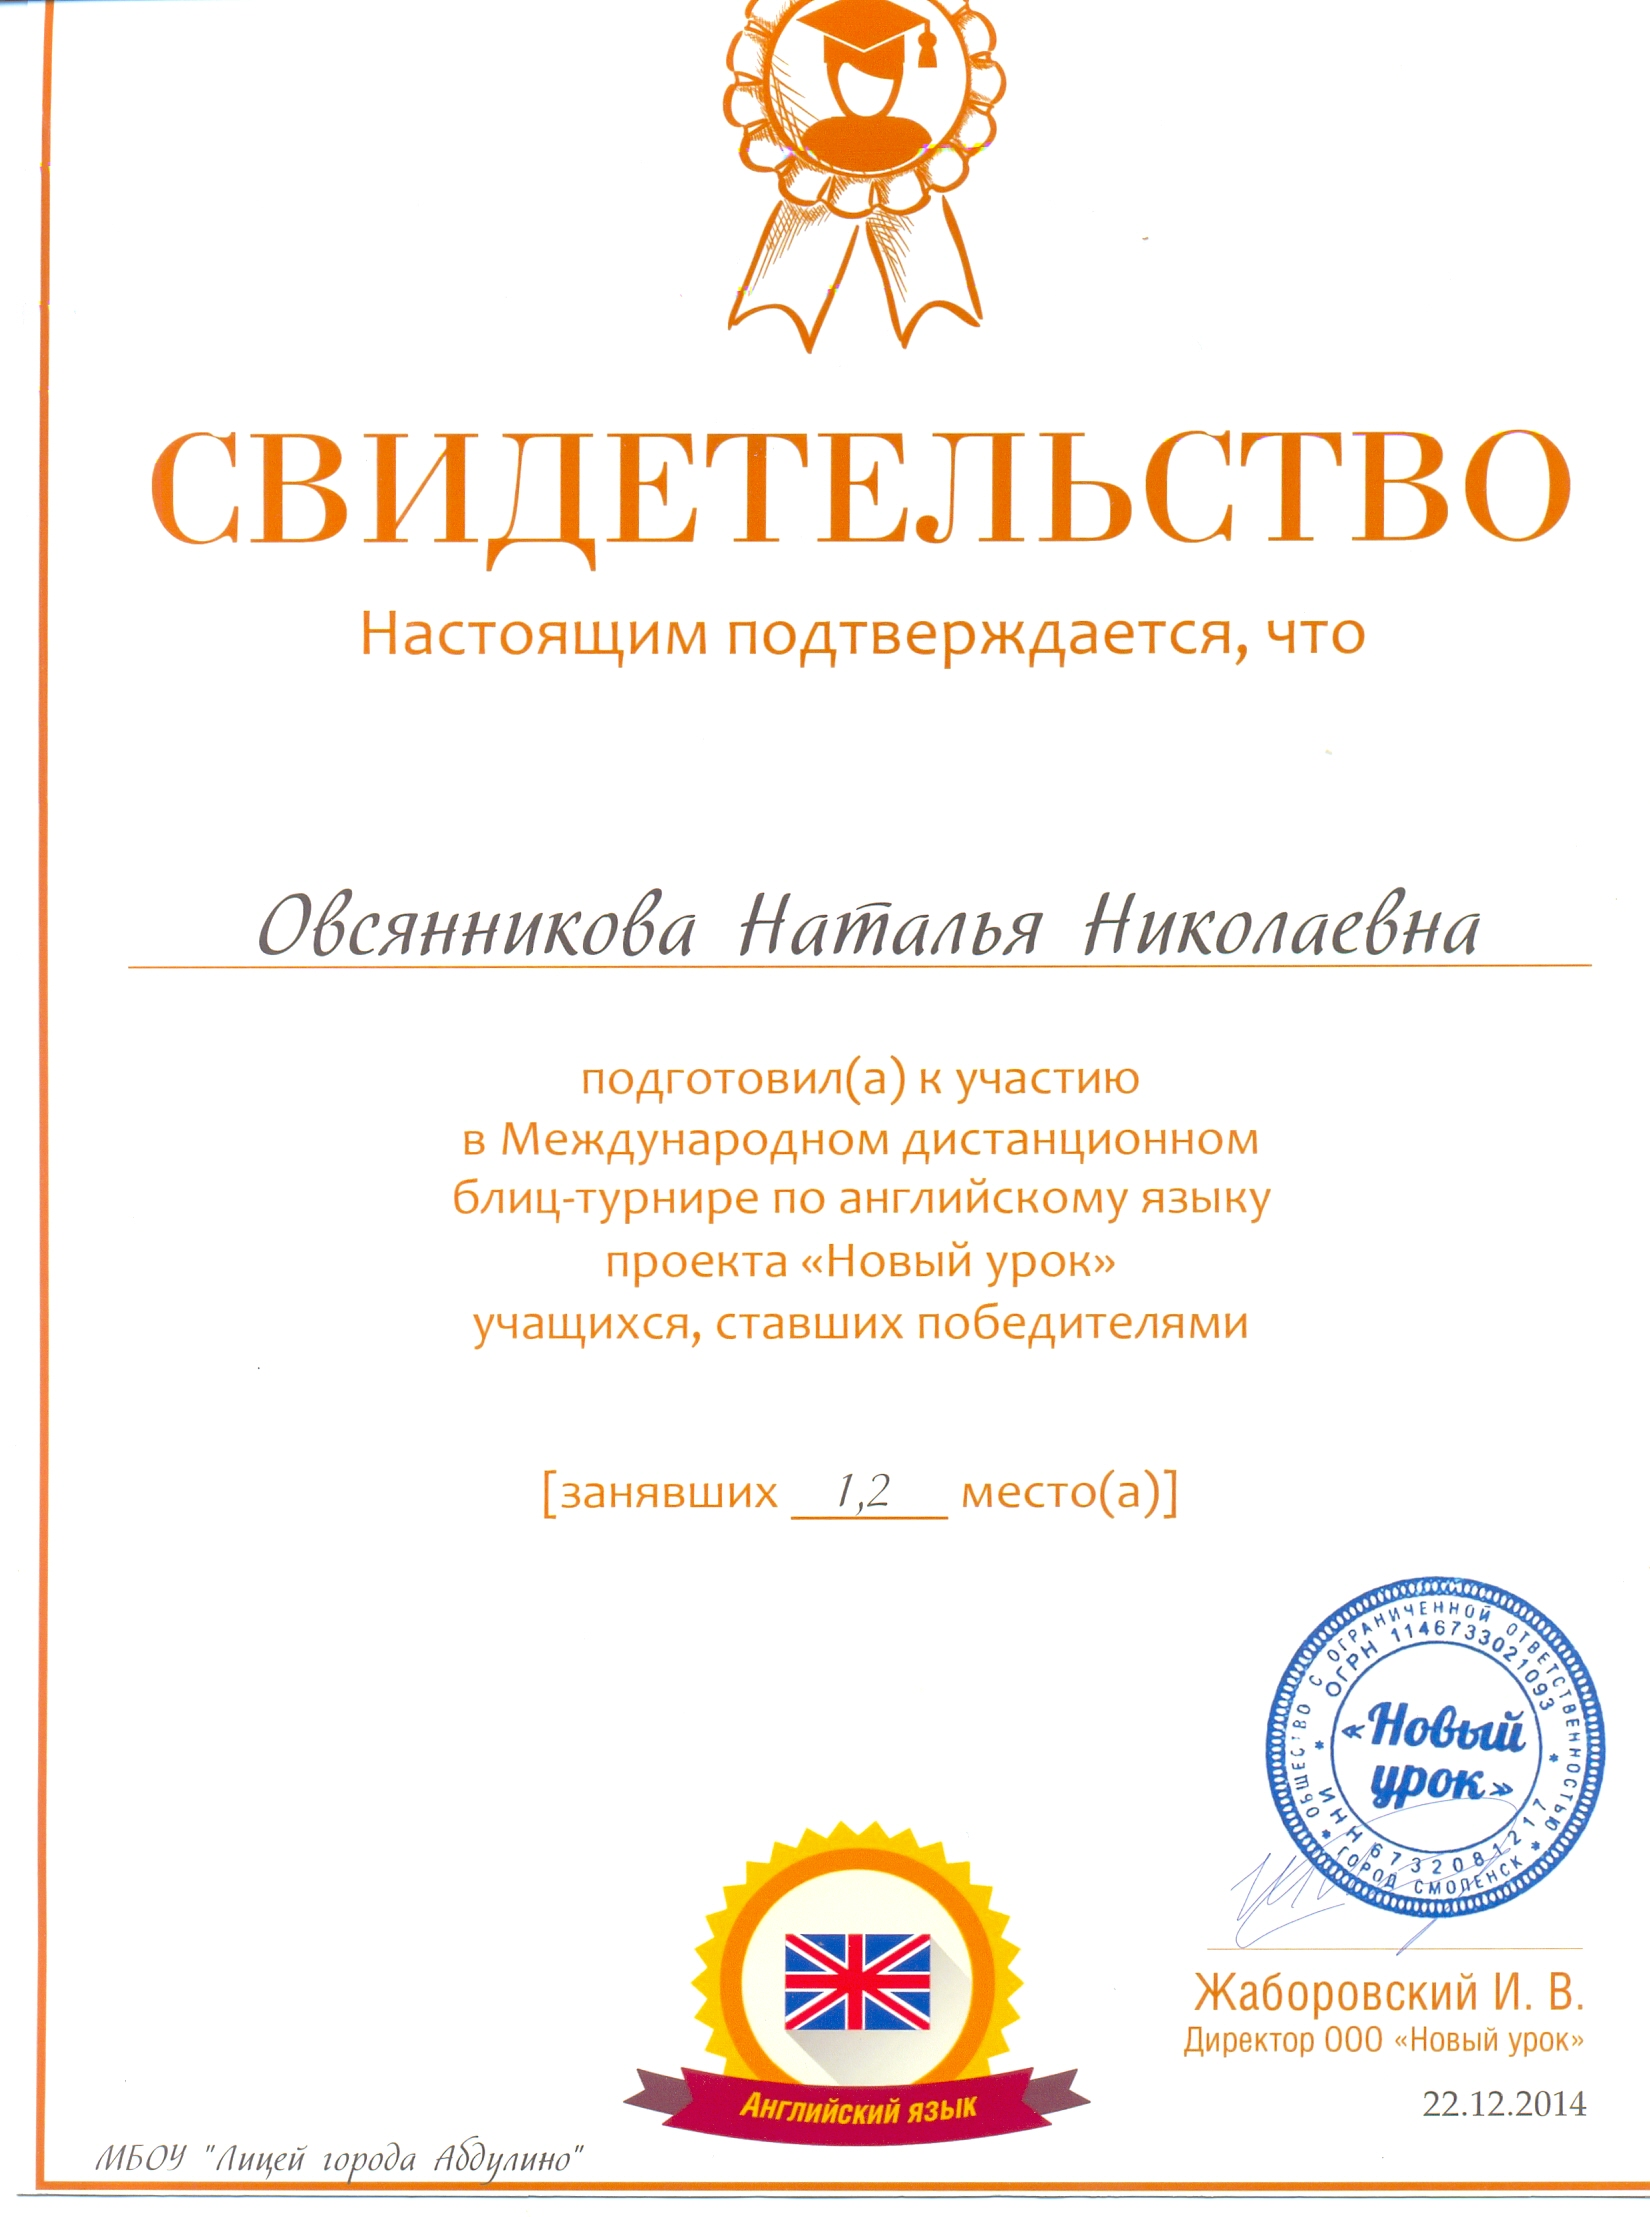 hello_html_m5bfc9e74.jpg